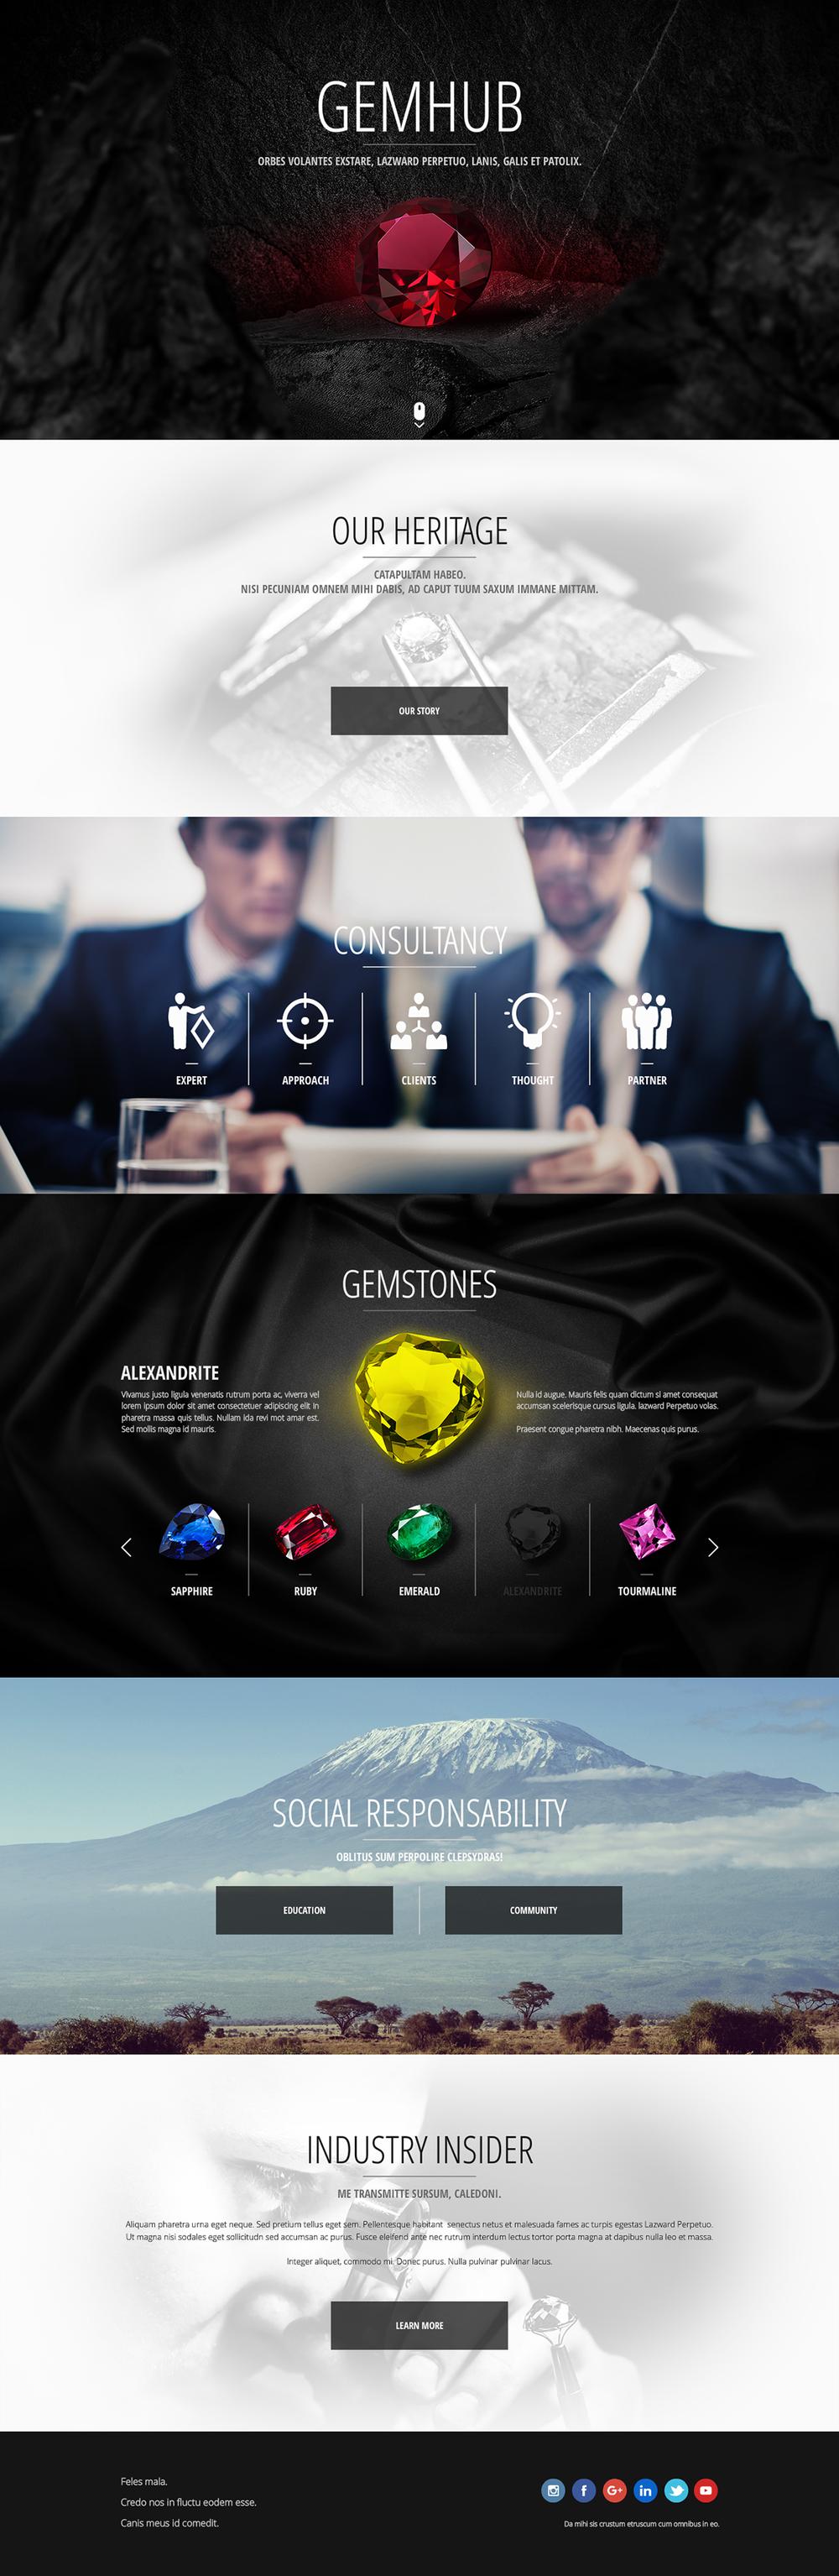 W_Web_GEMHUBwebsite0101.png